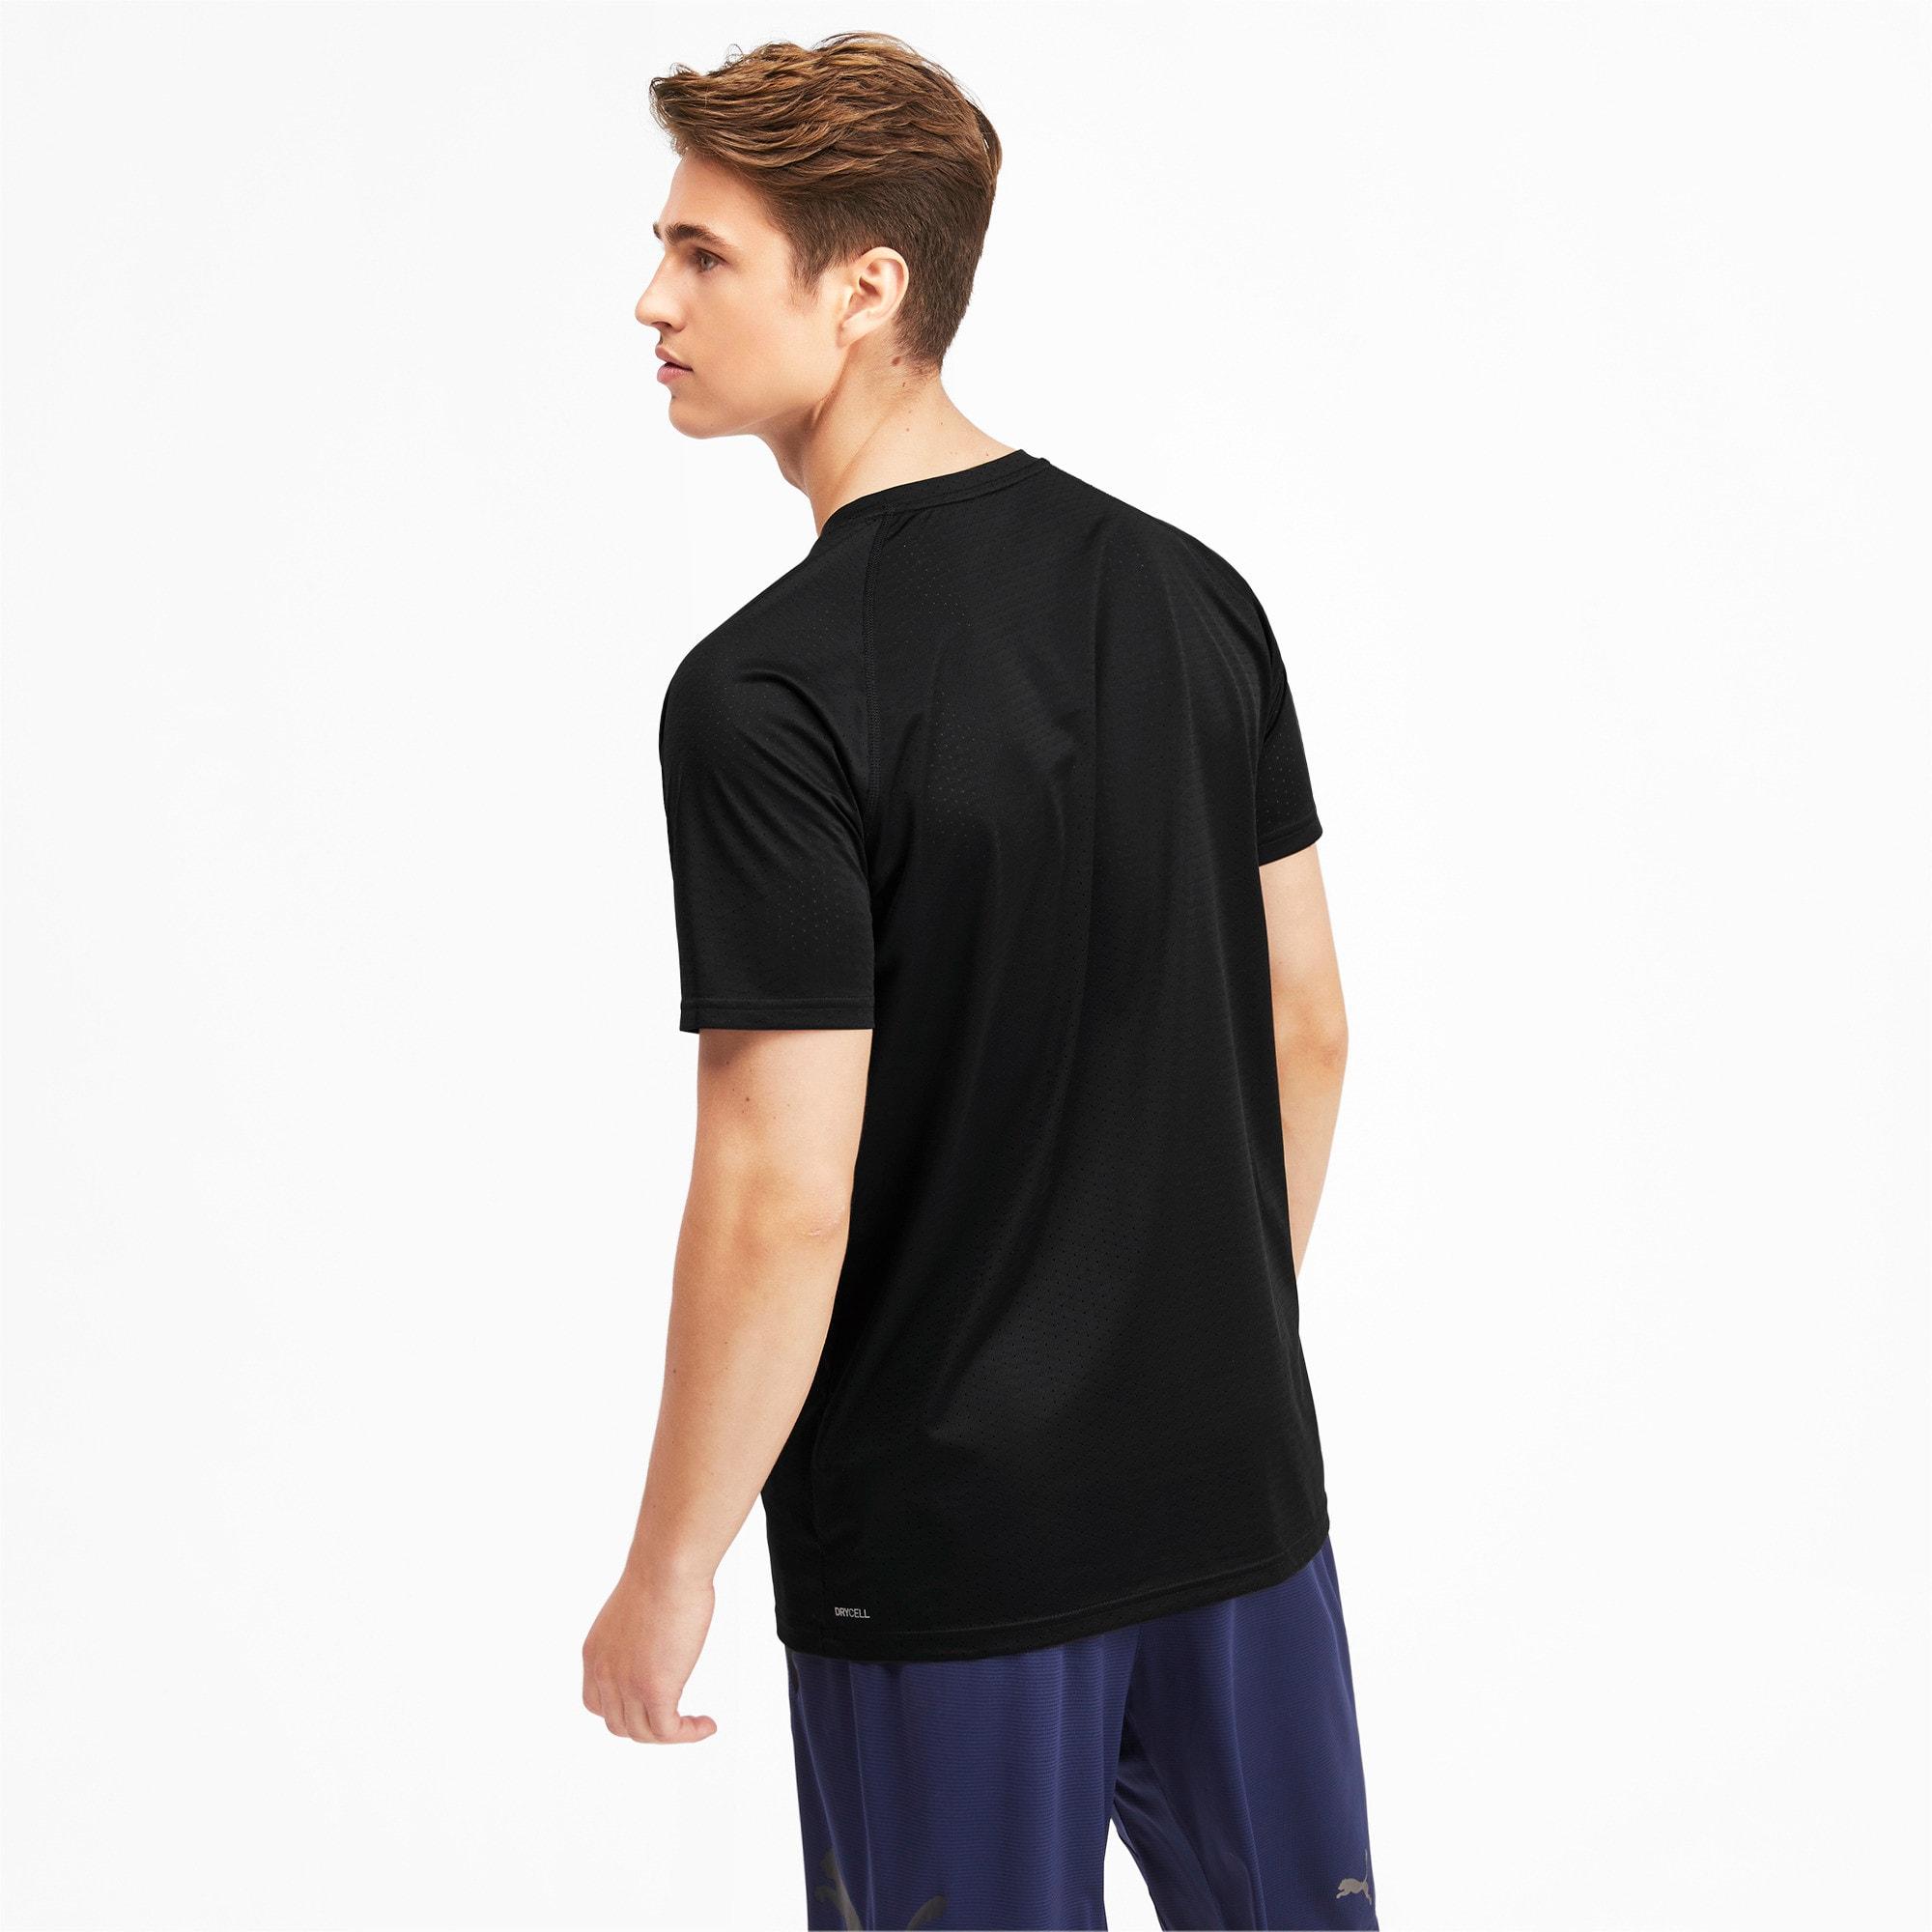 Thumbnail 2 of Tech Herren Training T-Shirt, Puma Black, medium